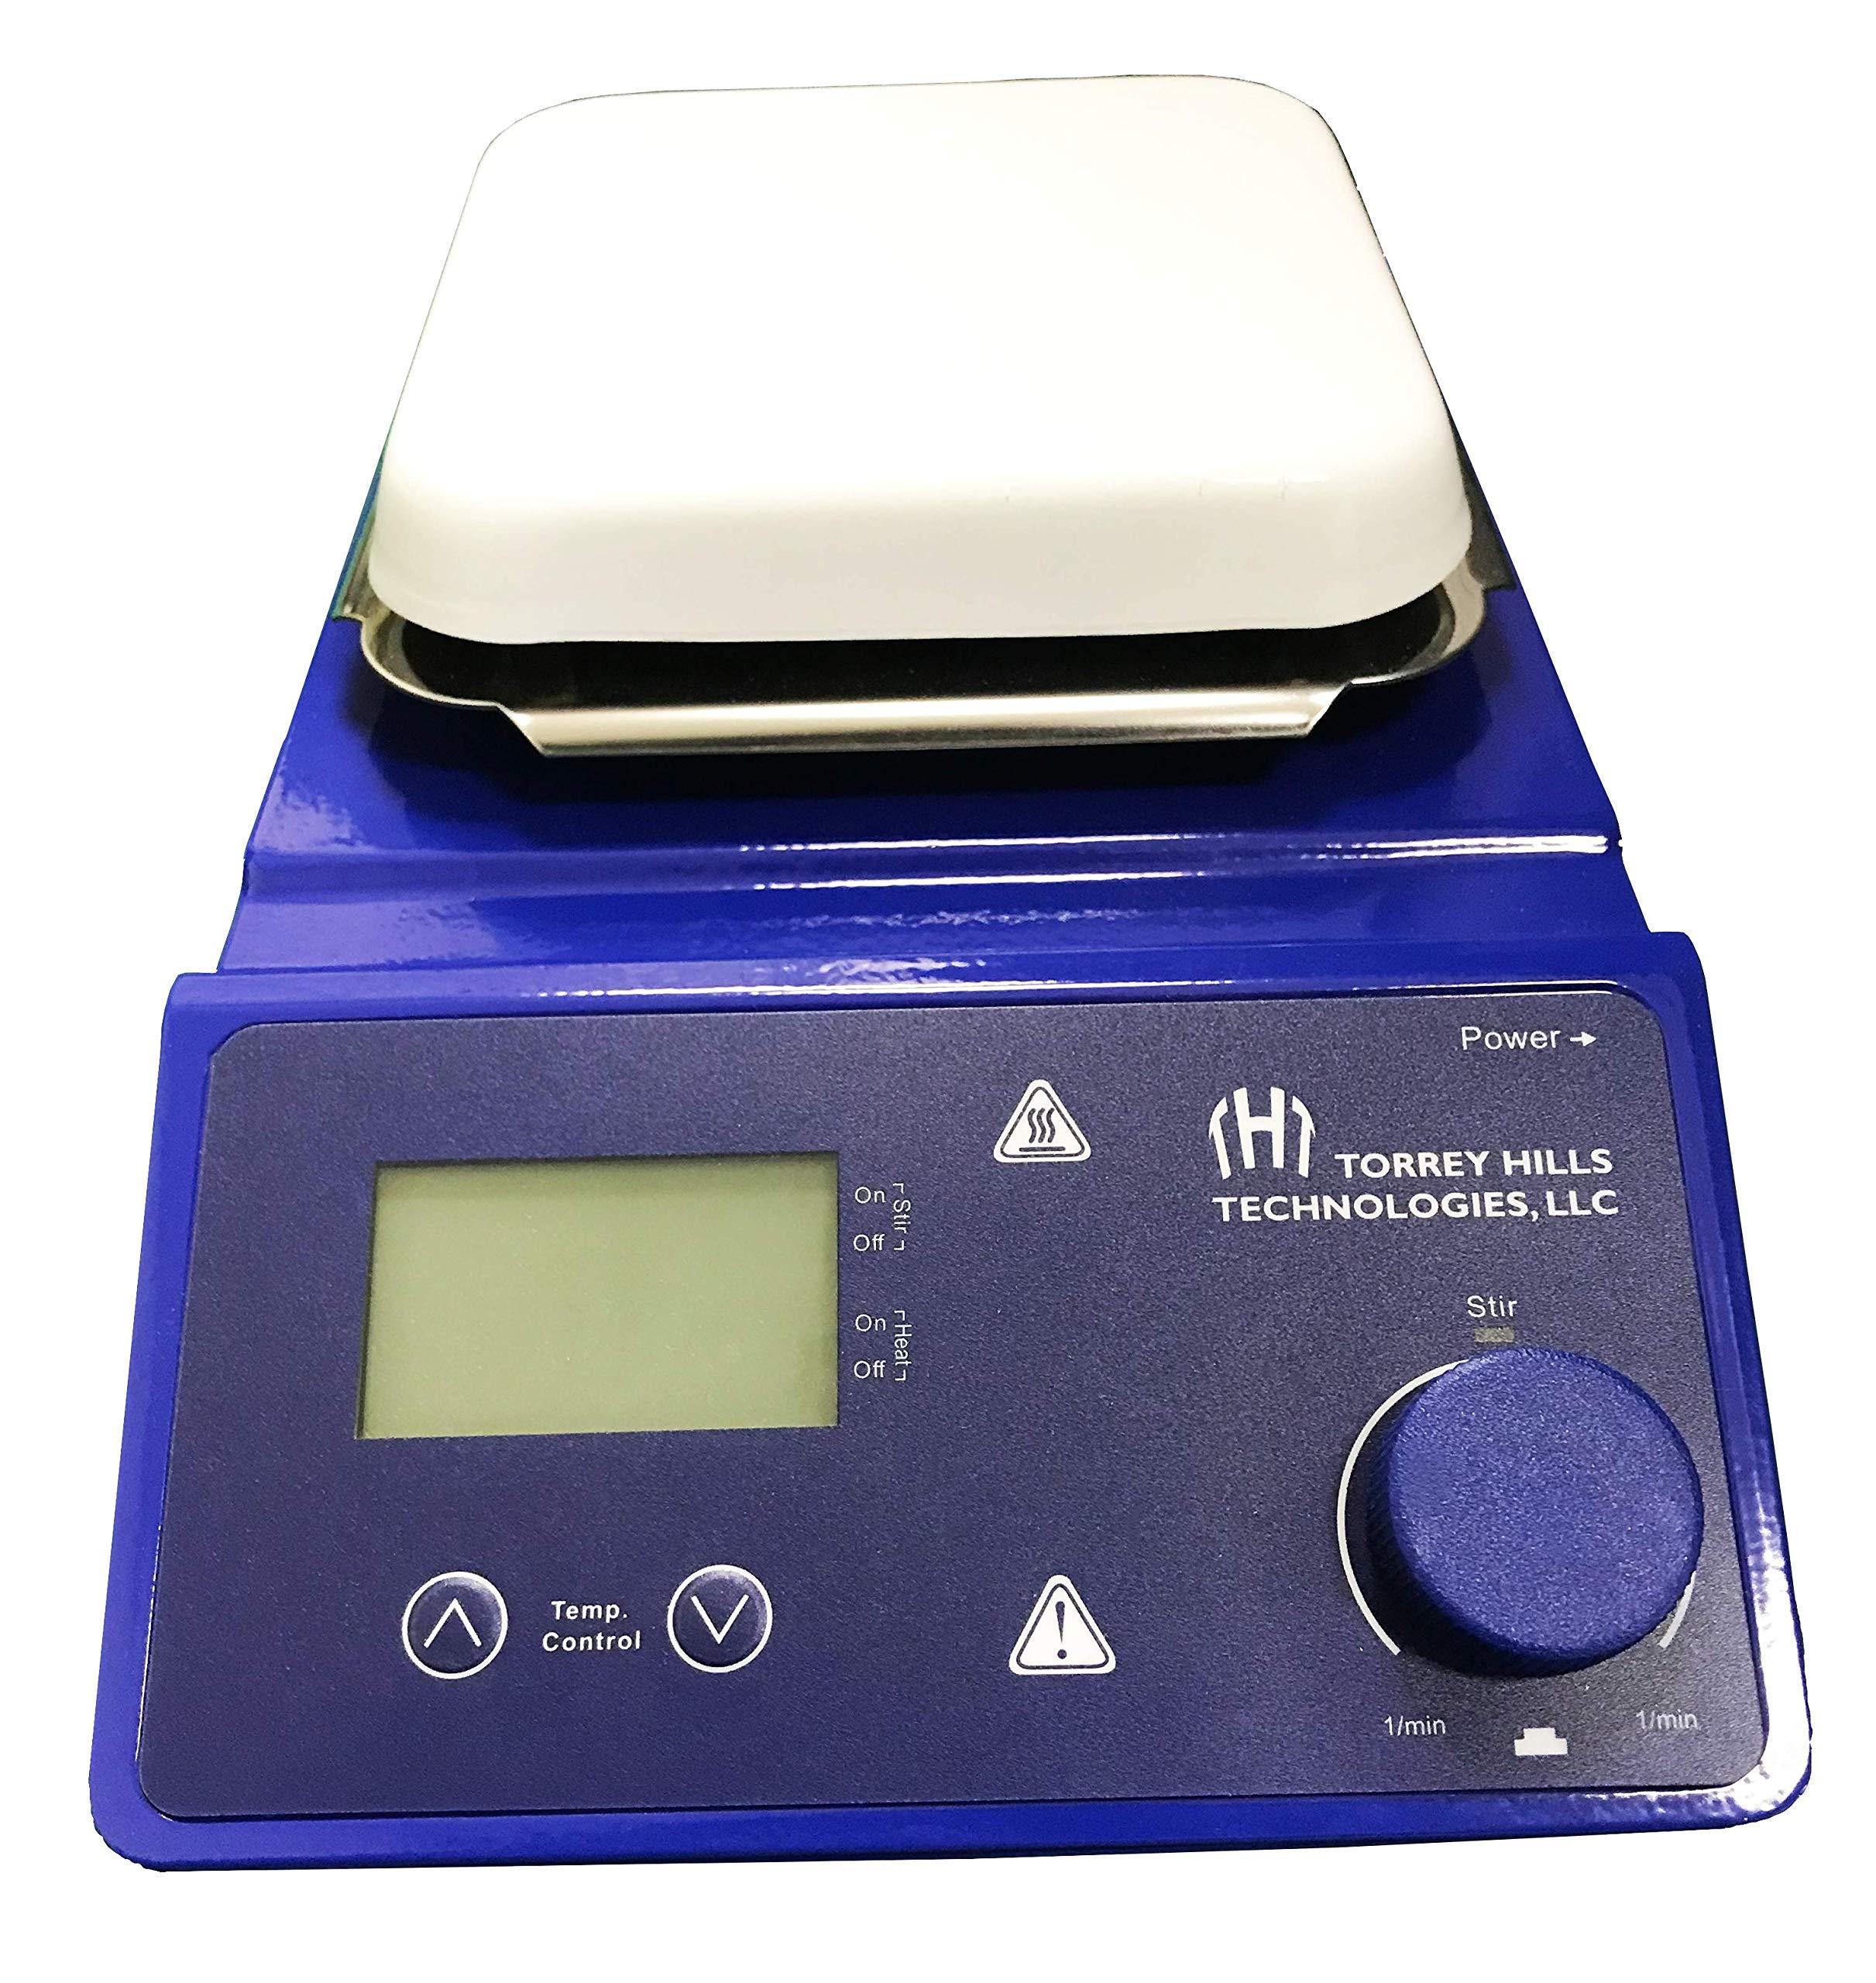 Magnetic Stirrer Hot Plate by Torrey Hills Tech | 5.3'' Ceramic Coated Plate, LED Display, 110V, 2L, 380°C Temperature Range with Excellent Chemical Resistance inclued 2 Stir Bars